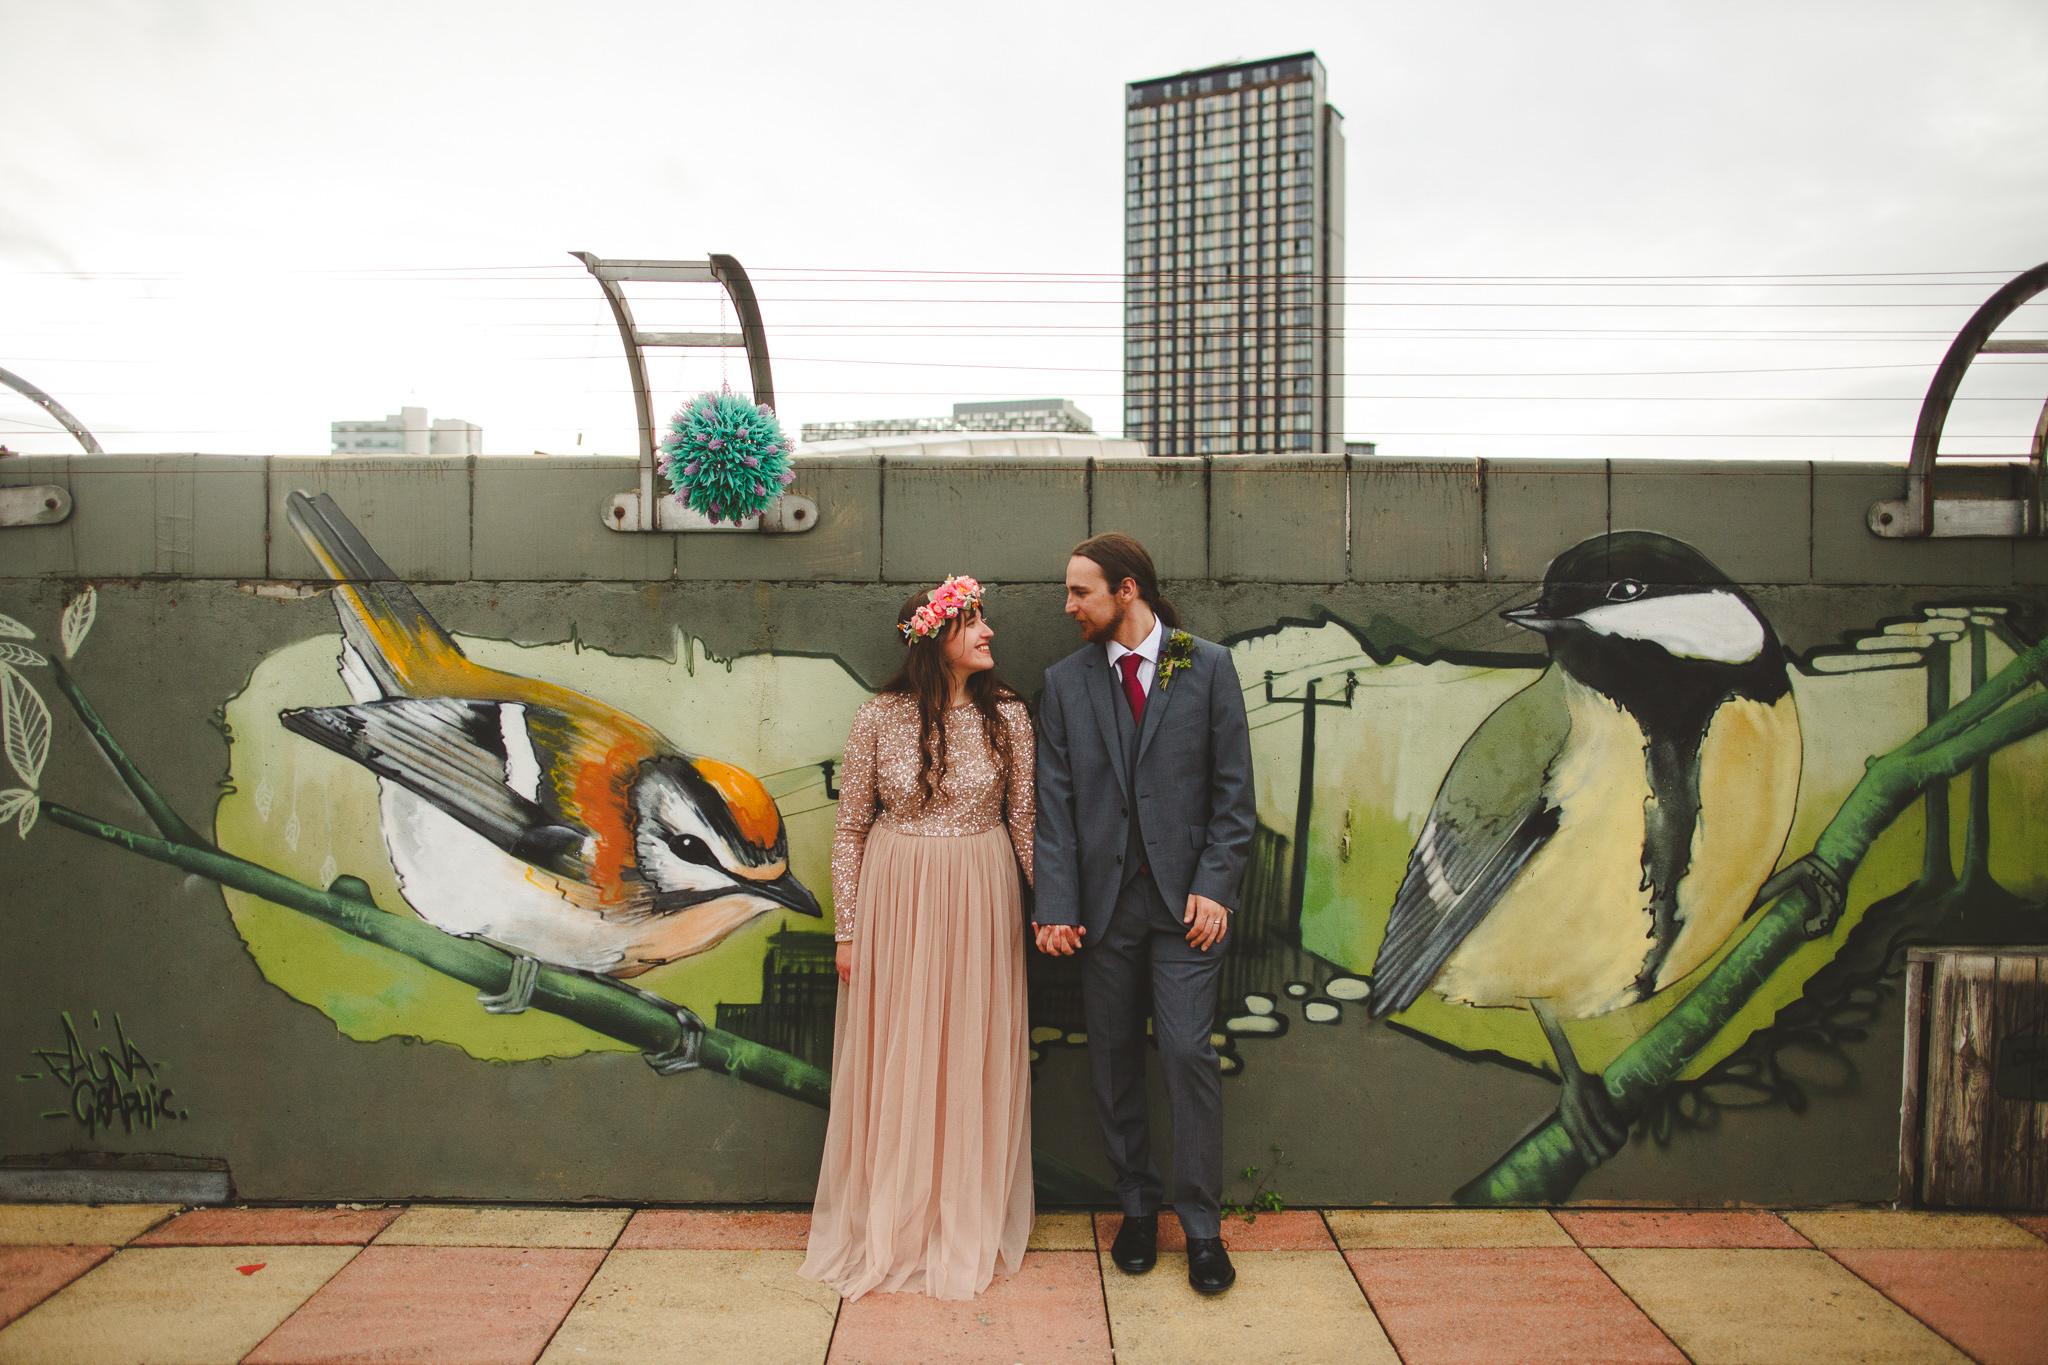 sheffield-wedding-photographer-roxysamblog-36.jpg